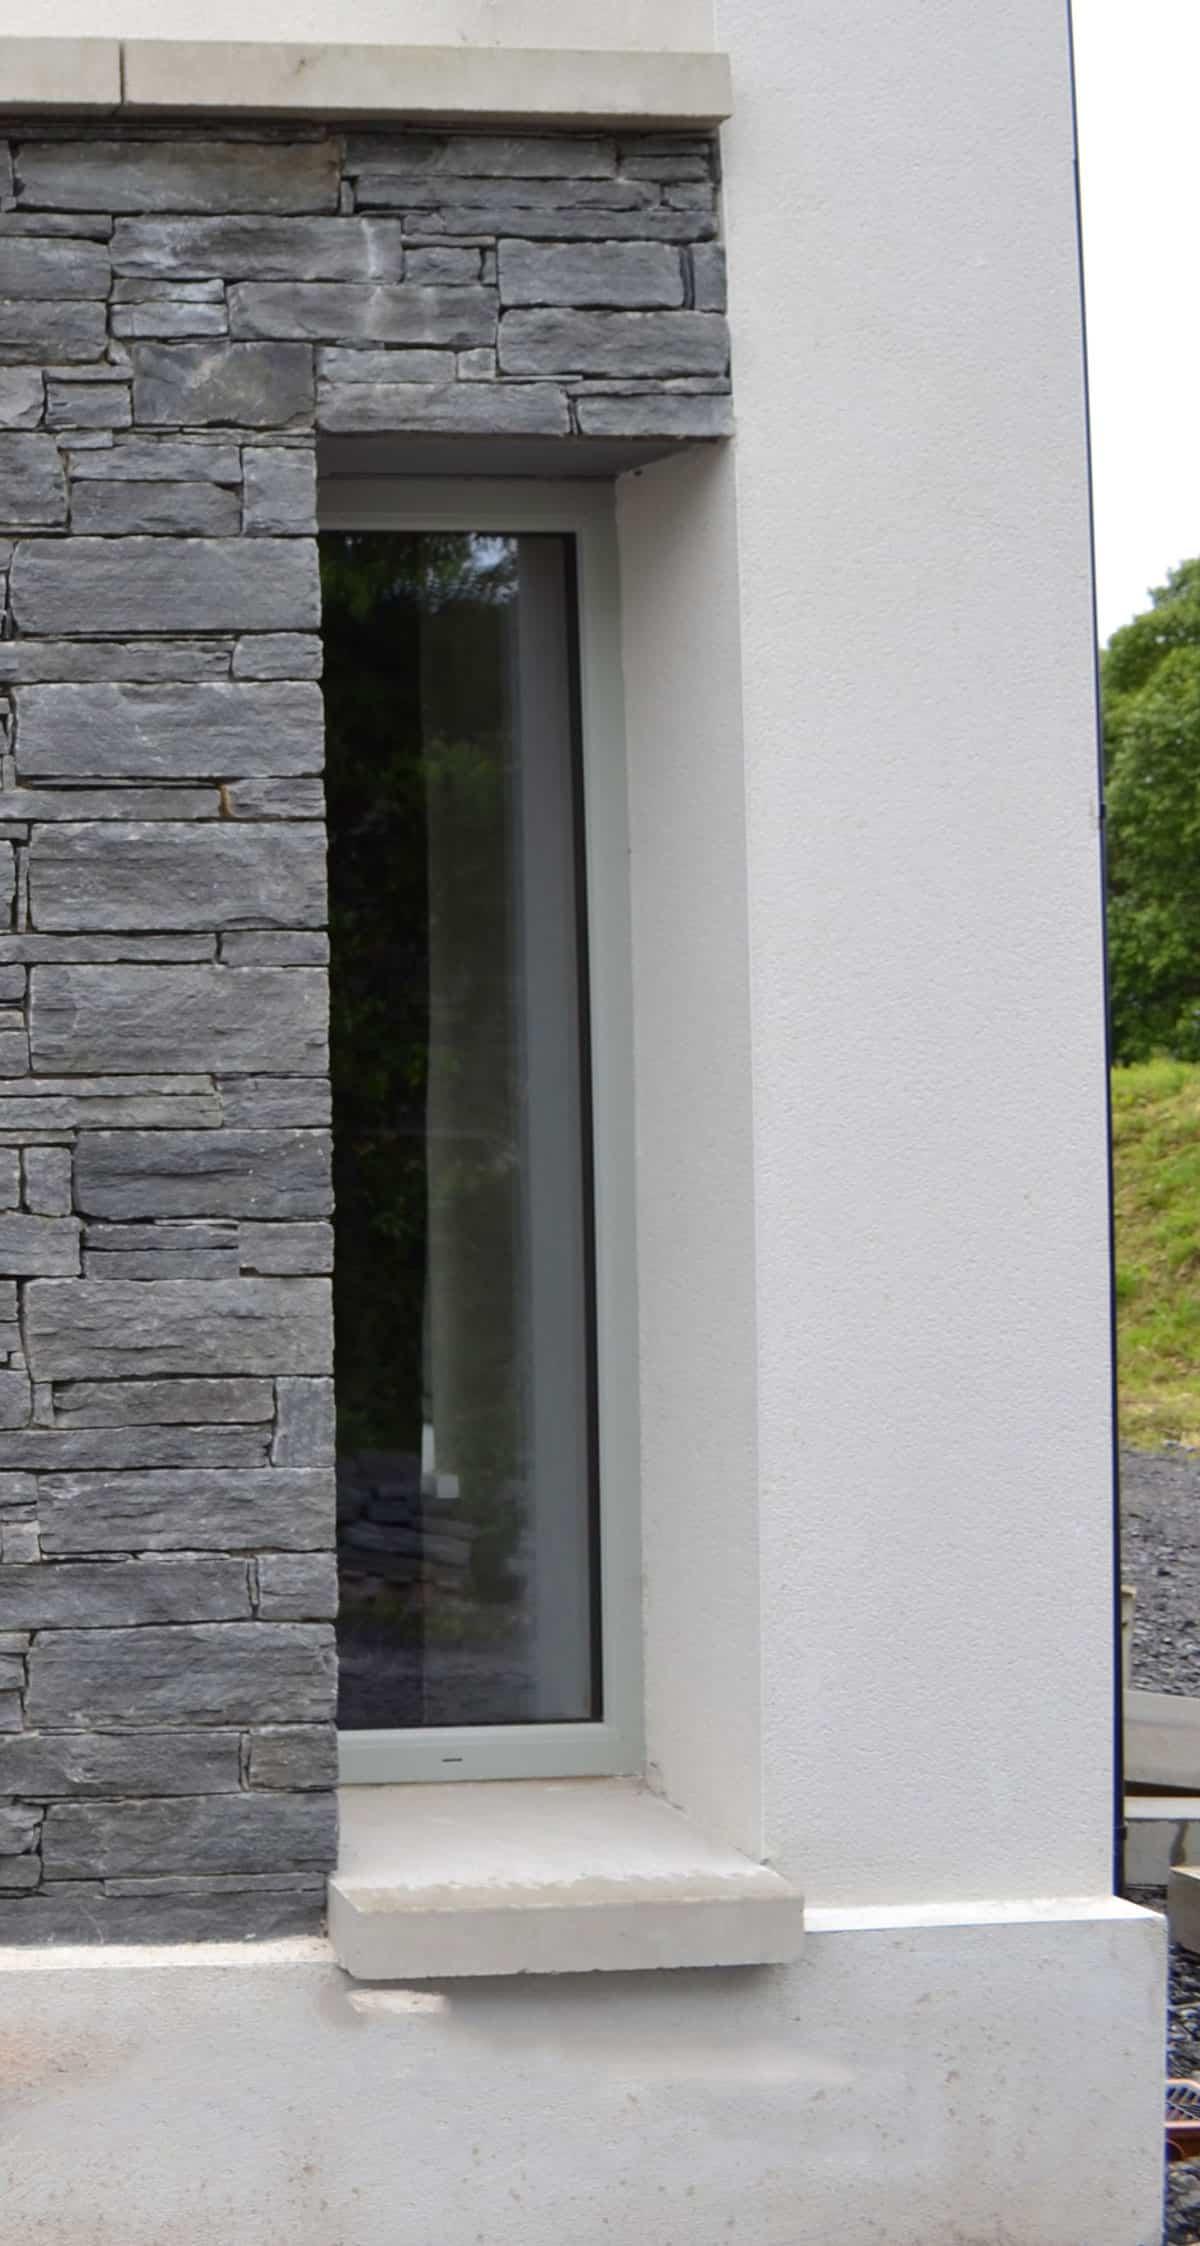 Fleming Dwelling - McMonagle Quartz Stone & Krend Render Finish